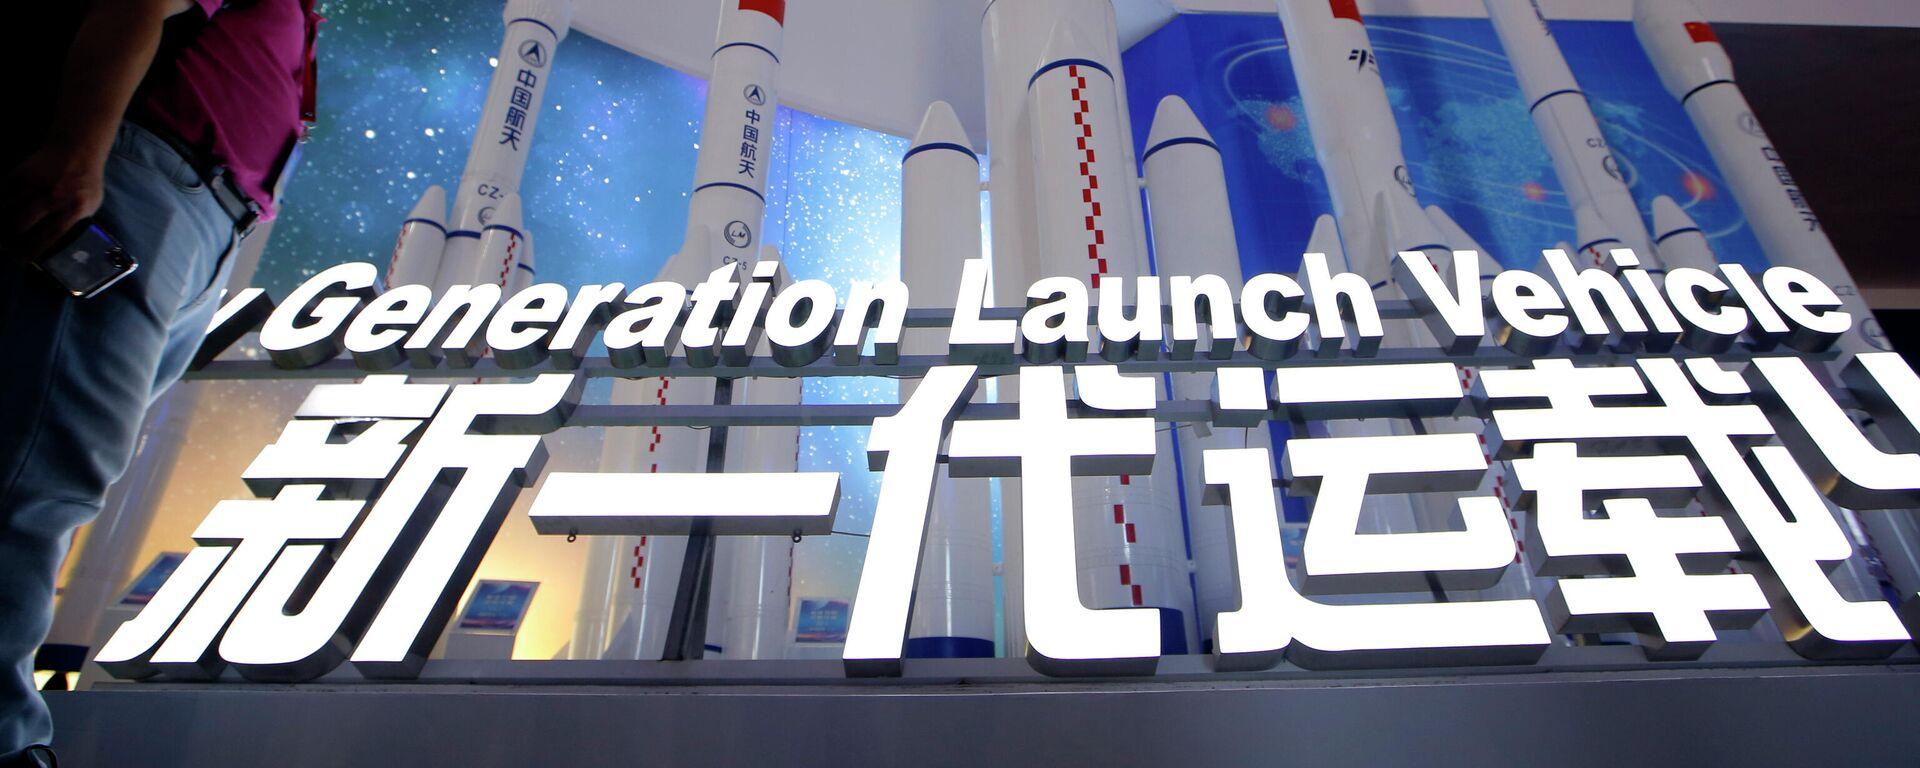 Cohetes Chang Zheng 6 - Sputnik Mundo, 1920, 27.04.2021